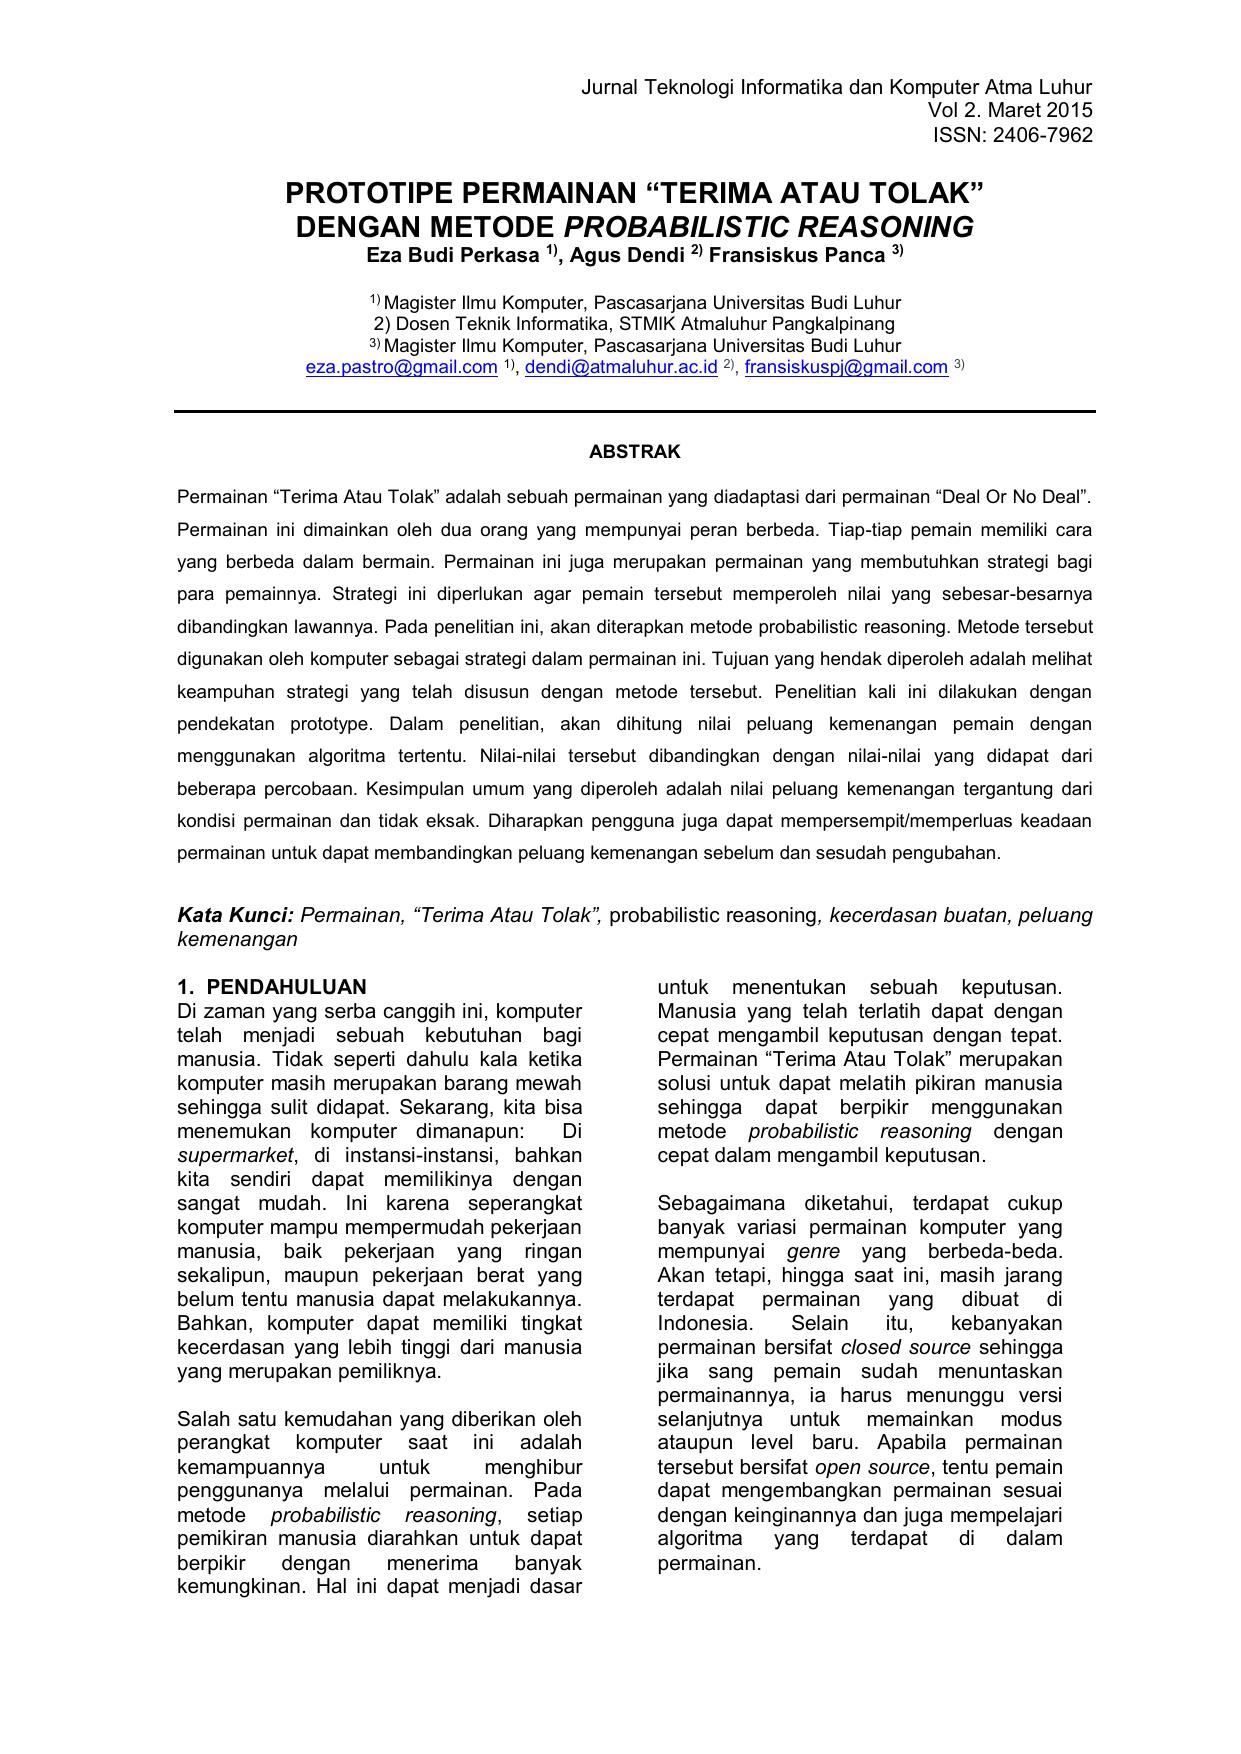 format sisfo - Jurnal STMIK Atma Luhur